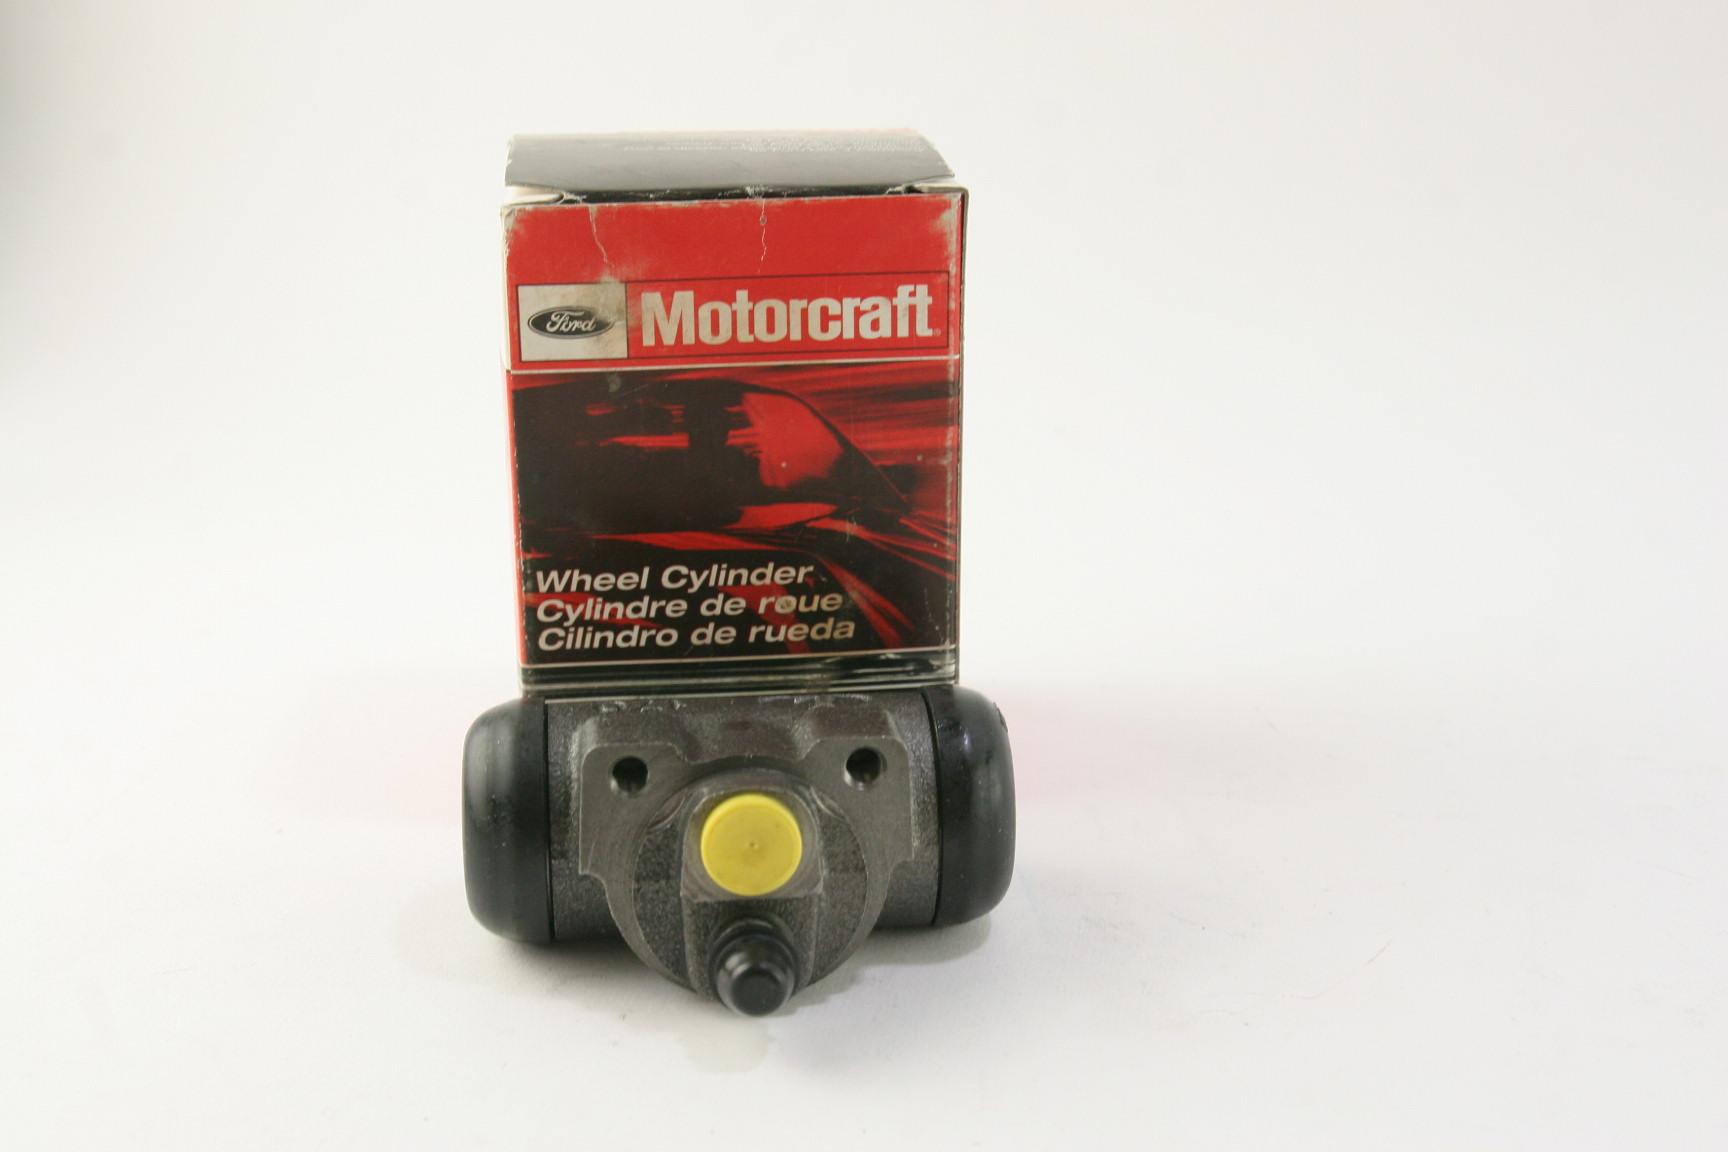 ~ New OEM Motorcraft BRWC31 Ford 1F1Z2V261BA Rear Brake Cylinder - image 1